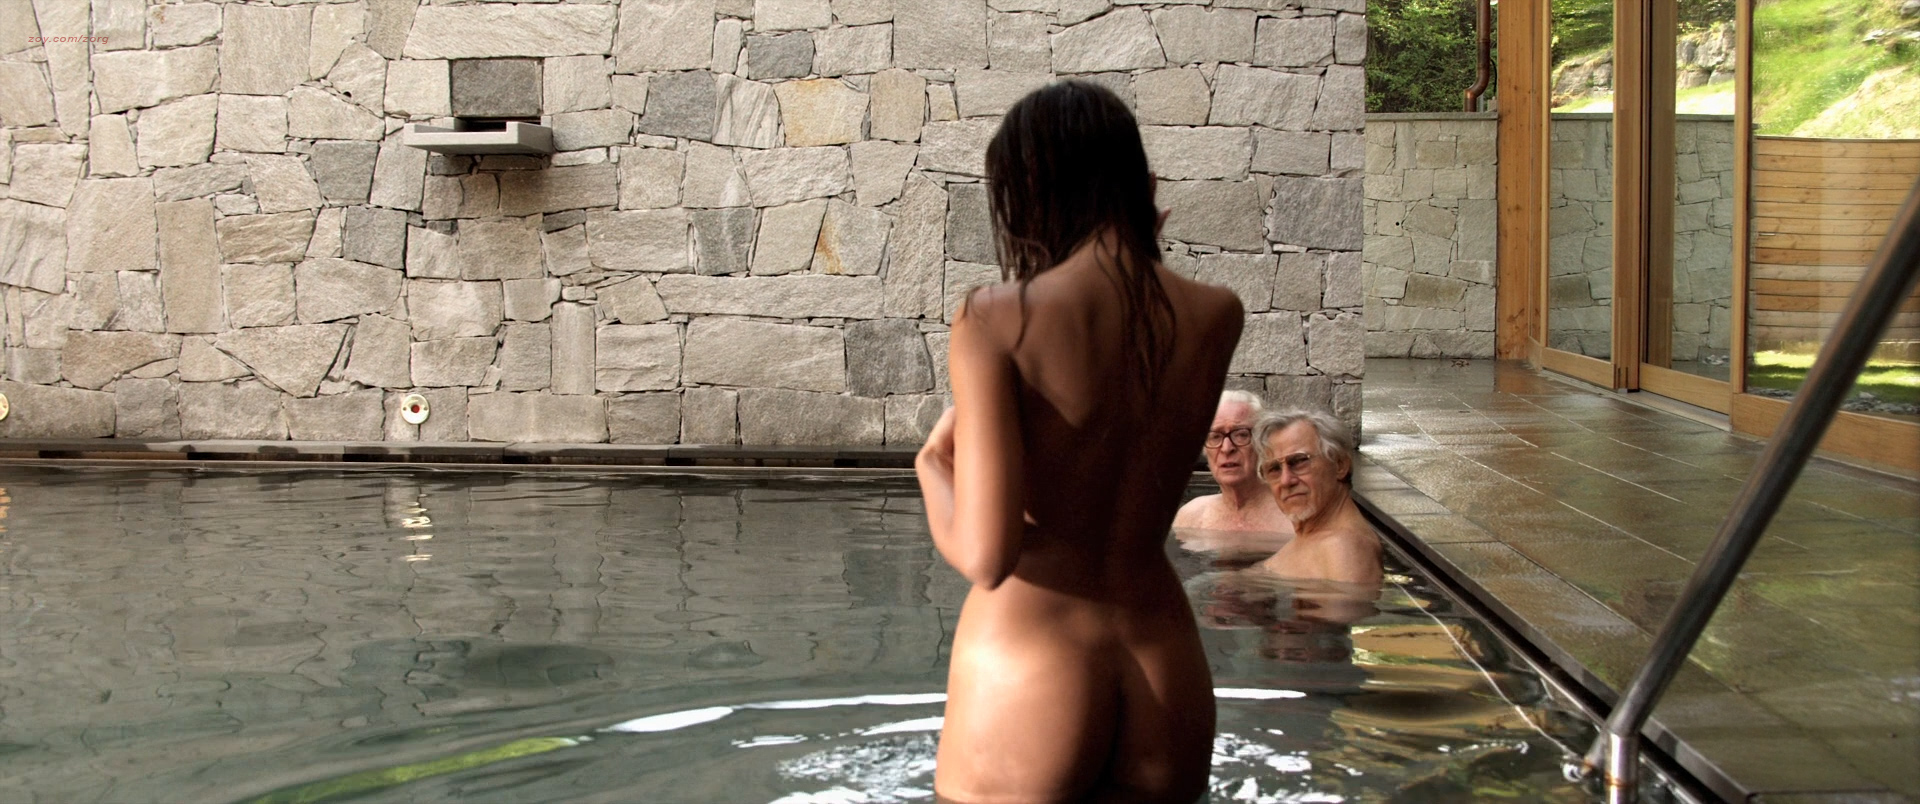 Madalina Diana Ghenea nude full frontal - Youth (IT-2015) HD 1080p (3)